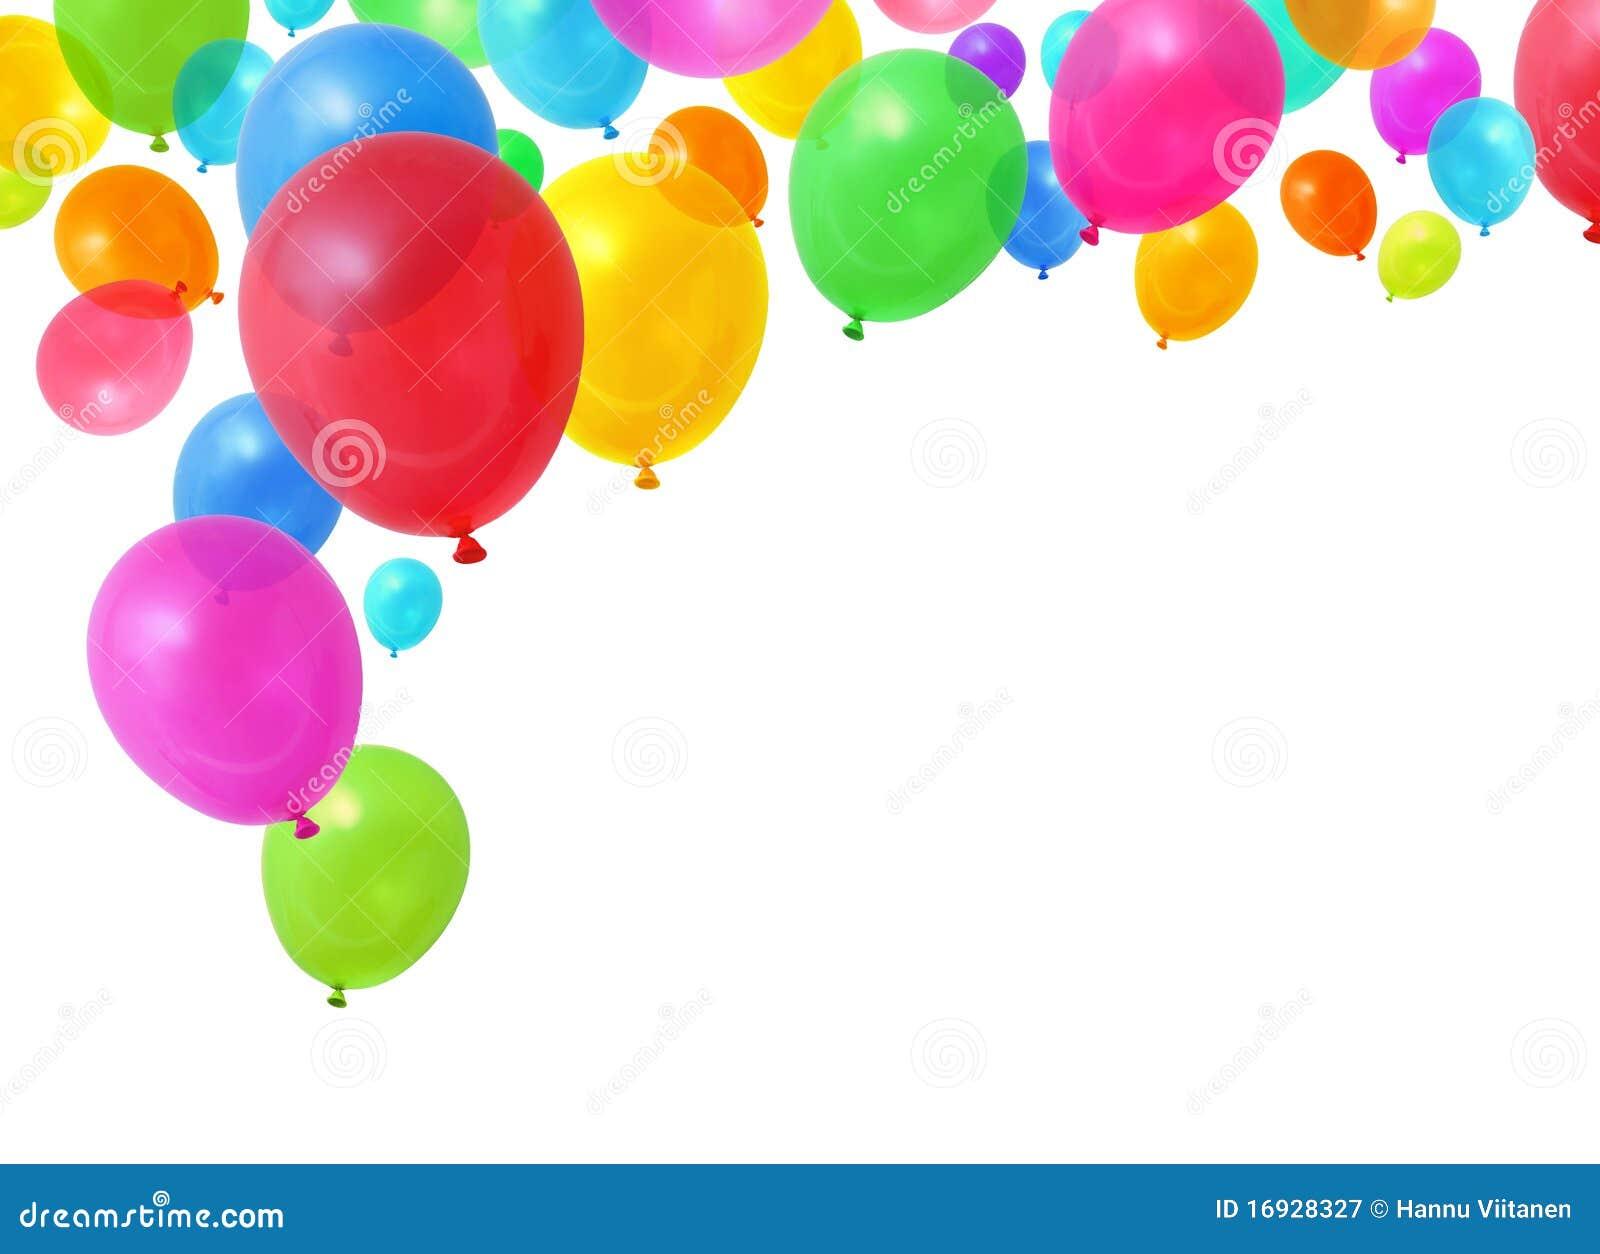 Landscape Birthday Balloons Border